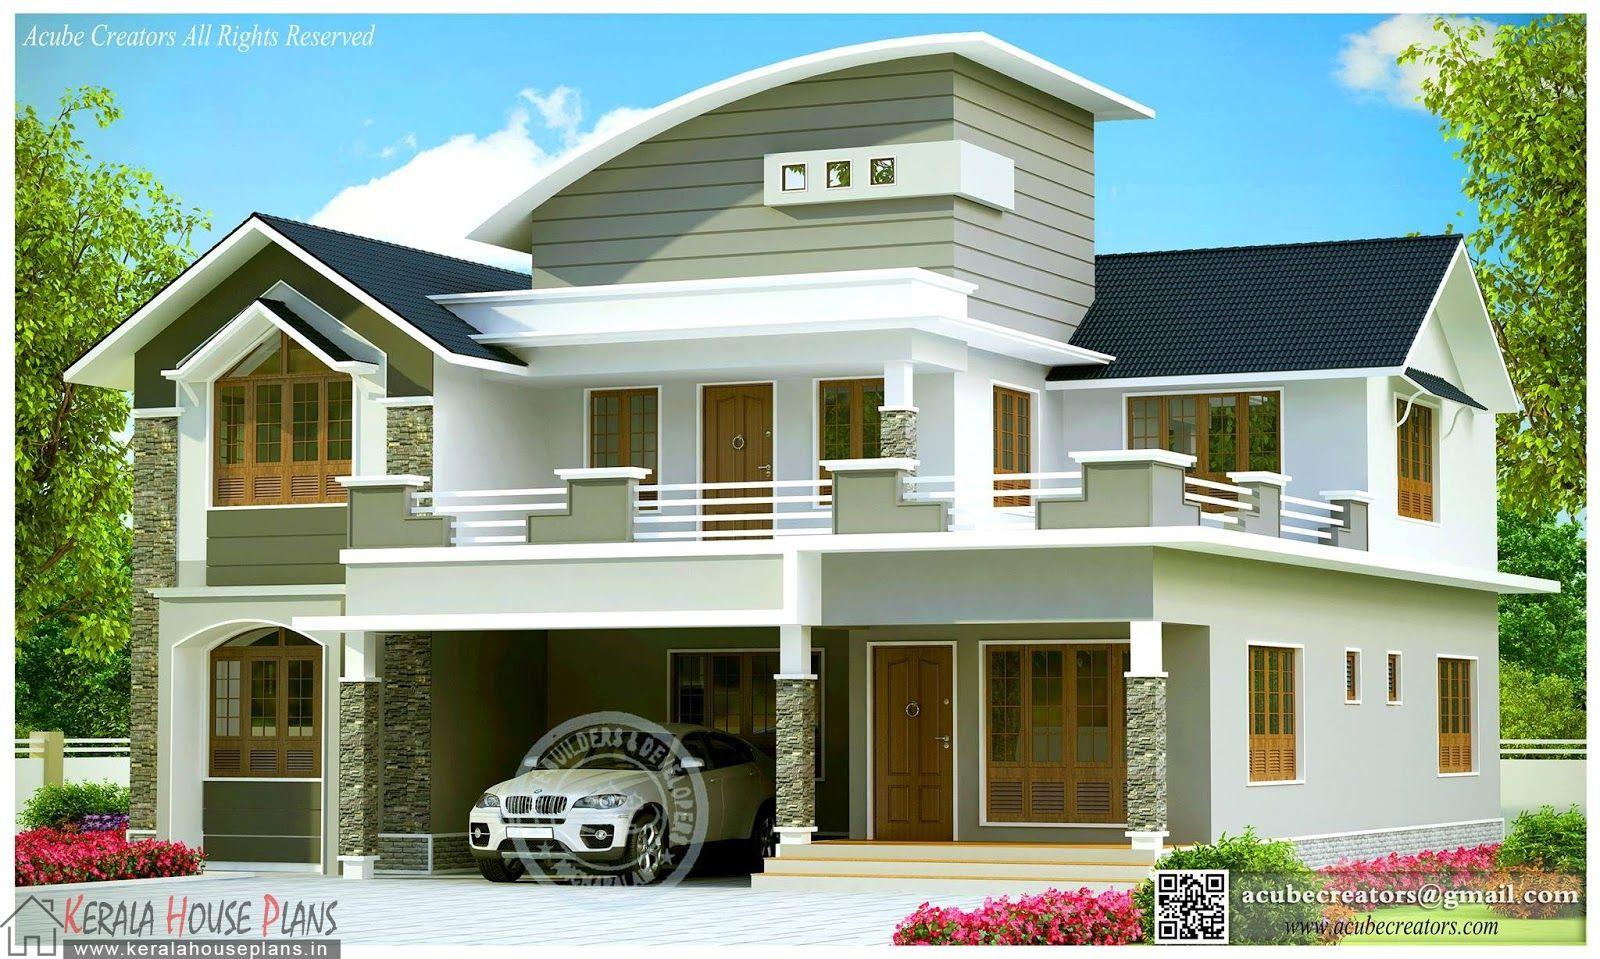 Interior design ideas for small homes in kerala beautiful contemporary house design kerala  house design